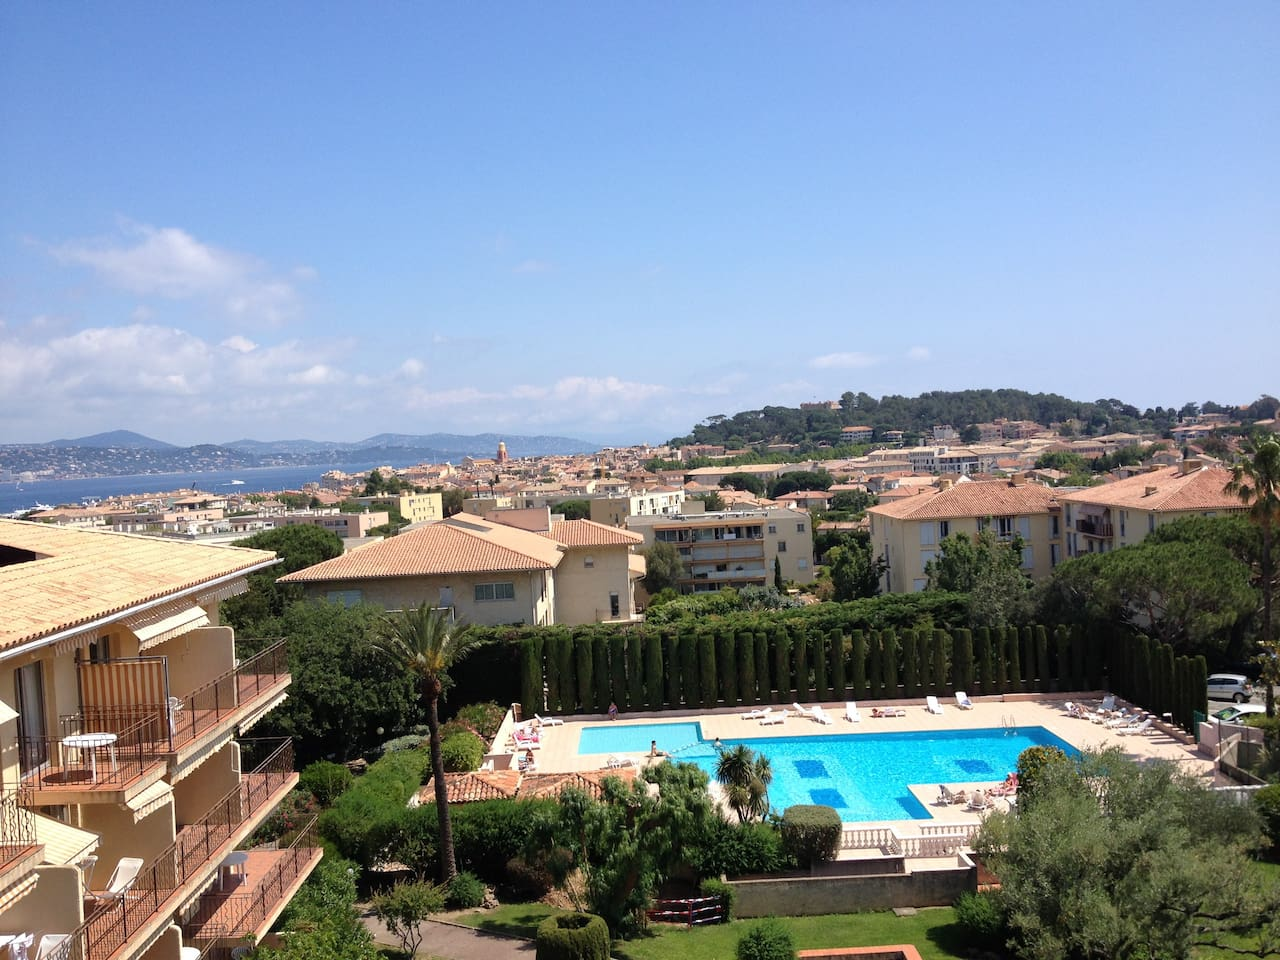 vue Mer Village Citadelle du balcon - sea view on St tropez Gulf-true view from appartment